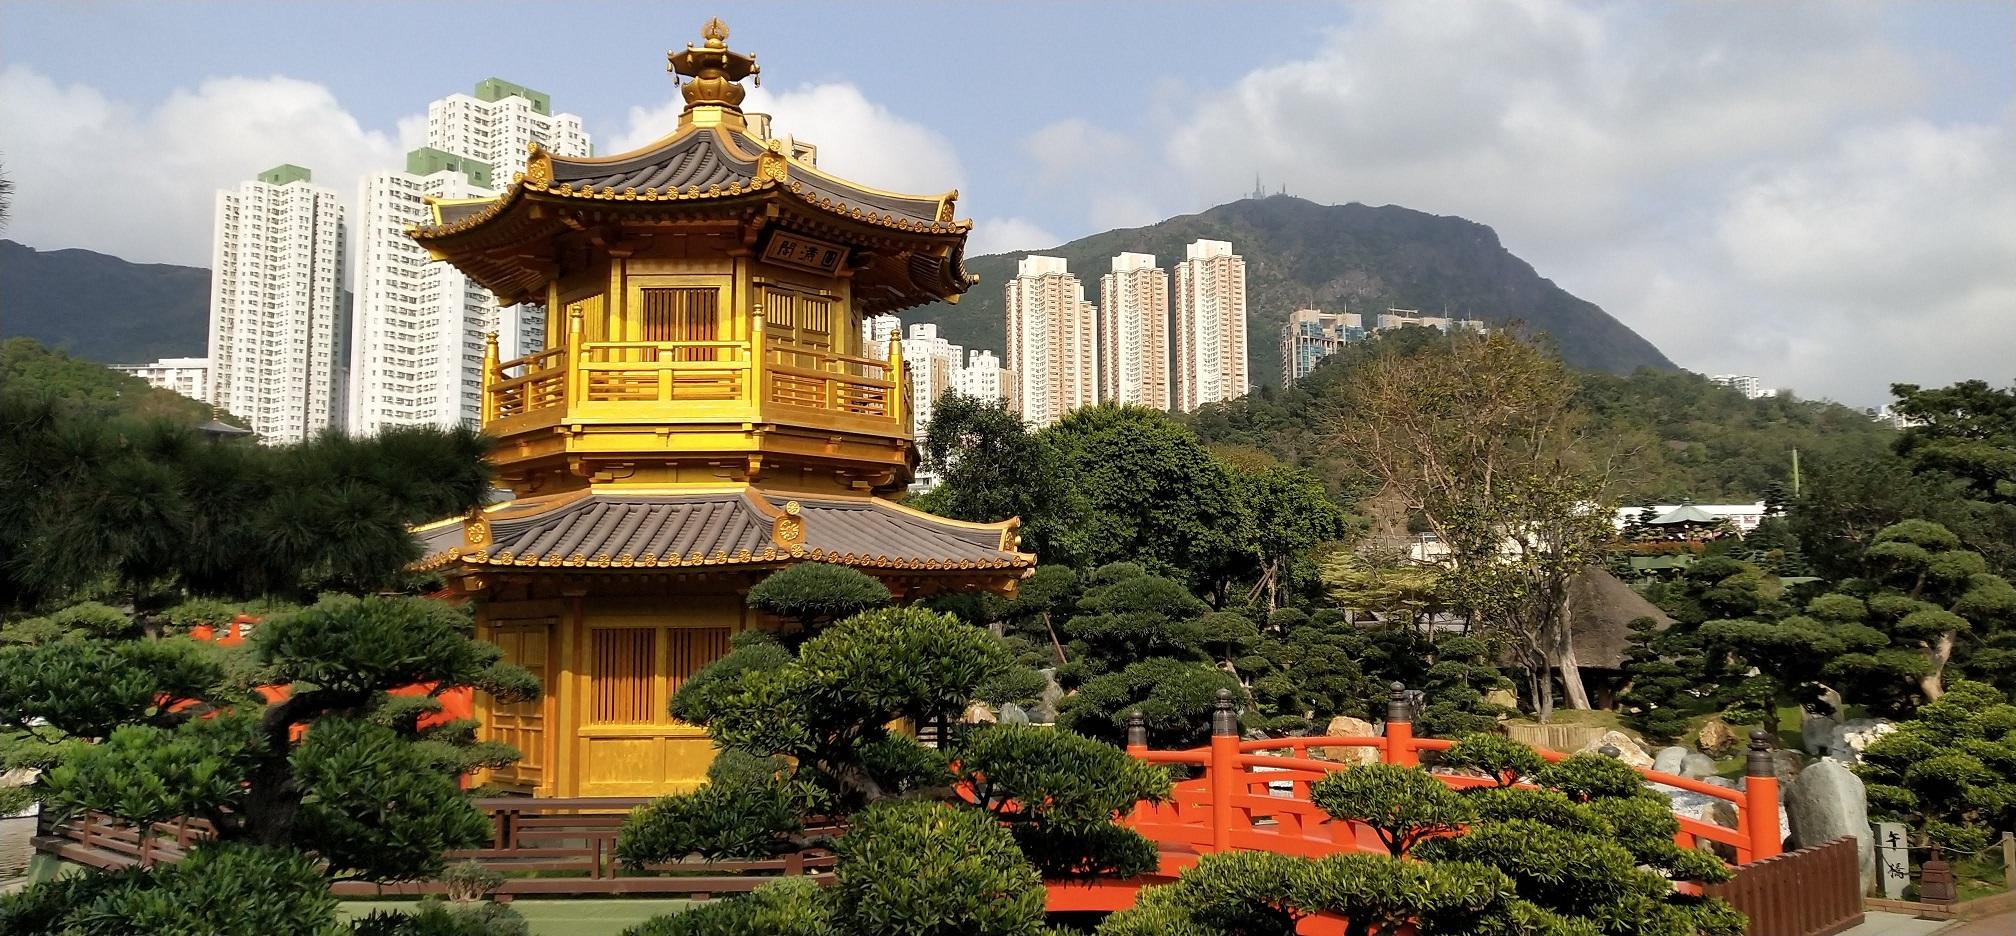 See Kowloon Peak from Nan Lian Garden